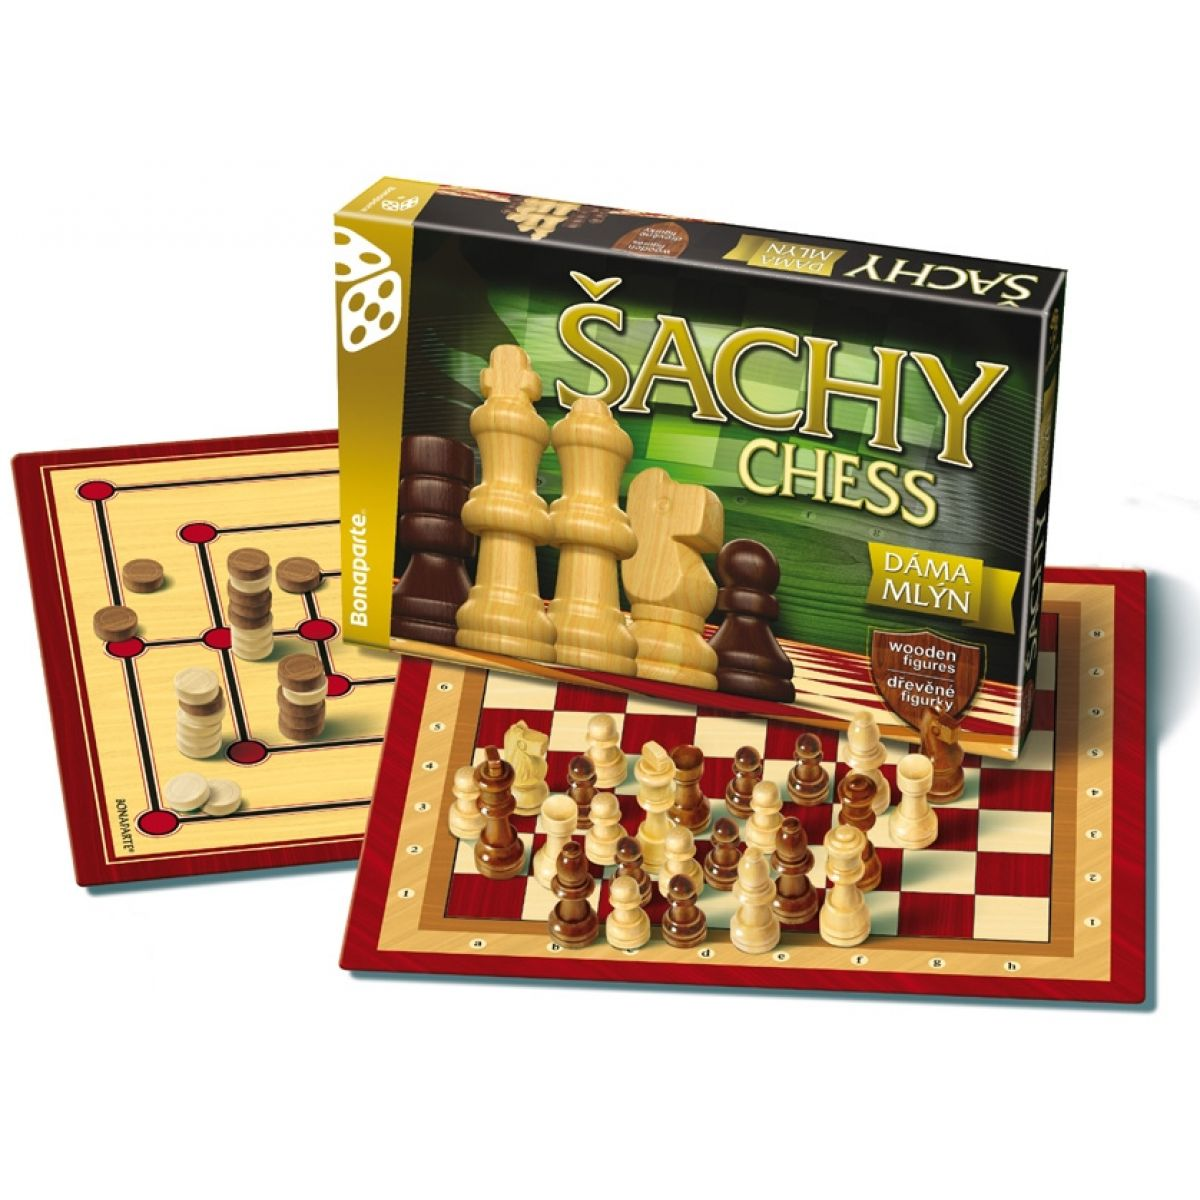 Bonaparte Šachy, dáma a mlýn